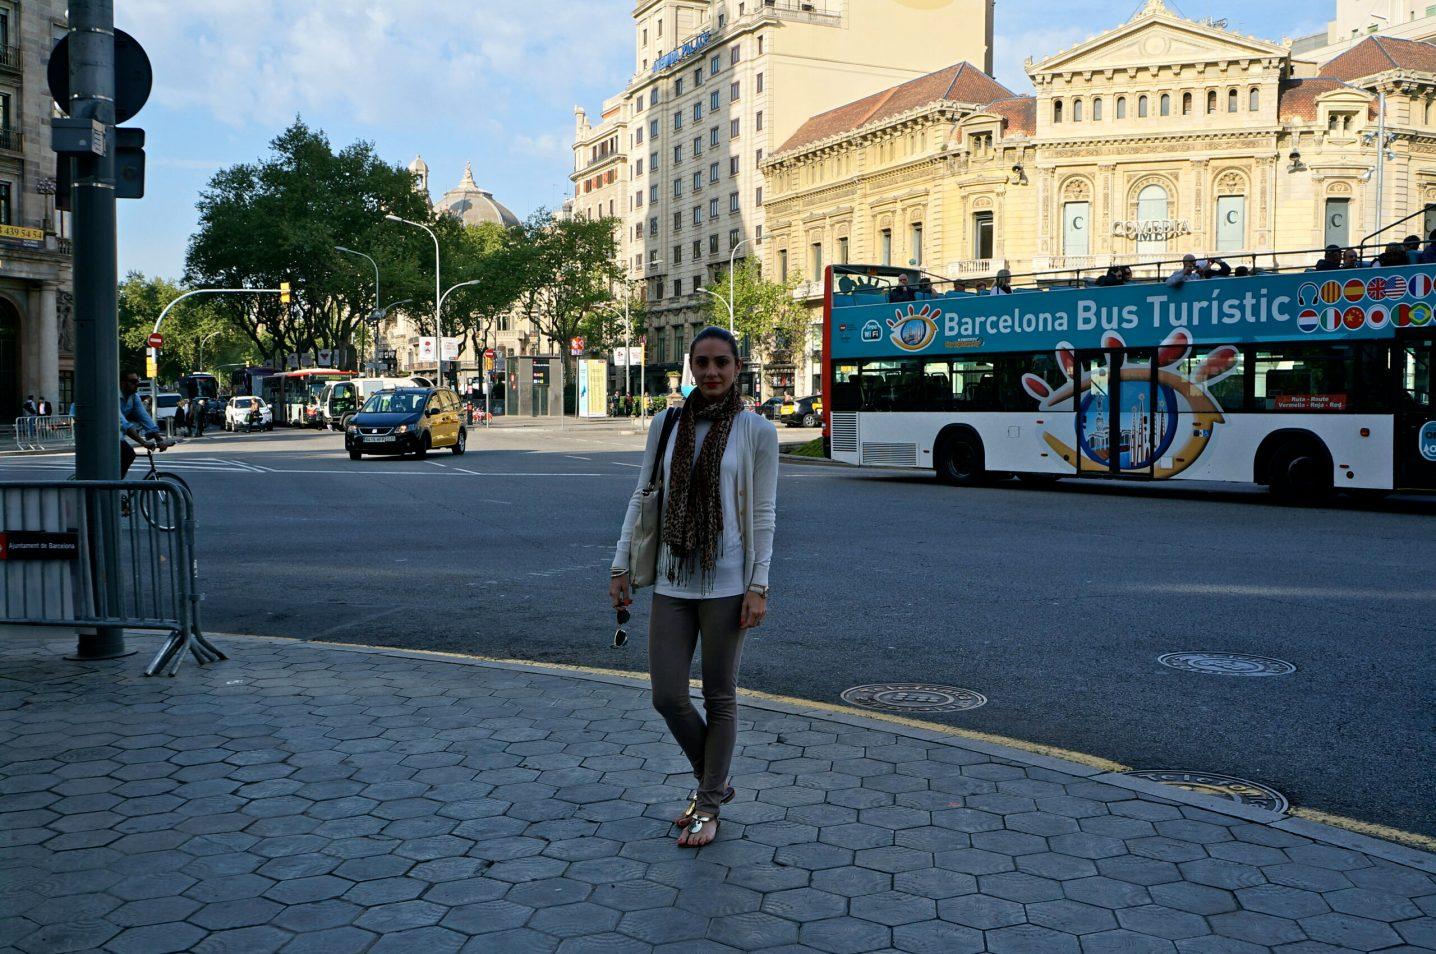 Plaza Catalunya Square